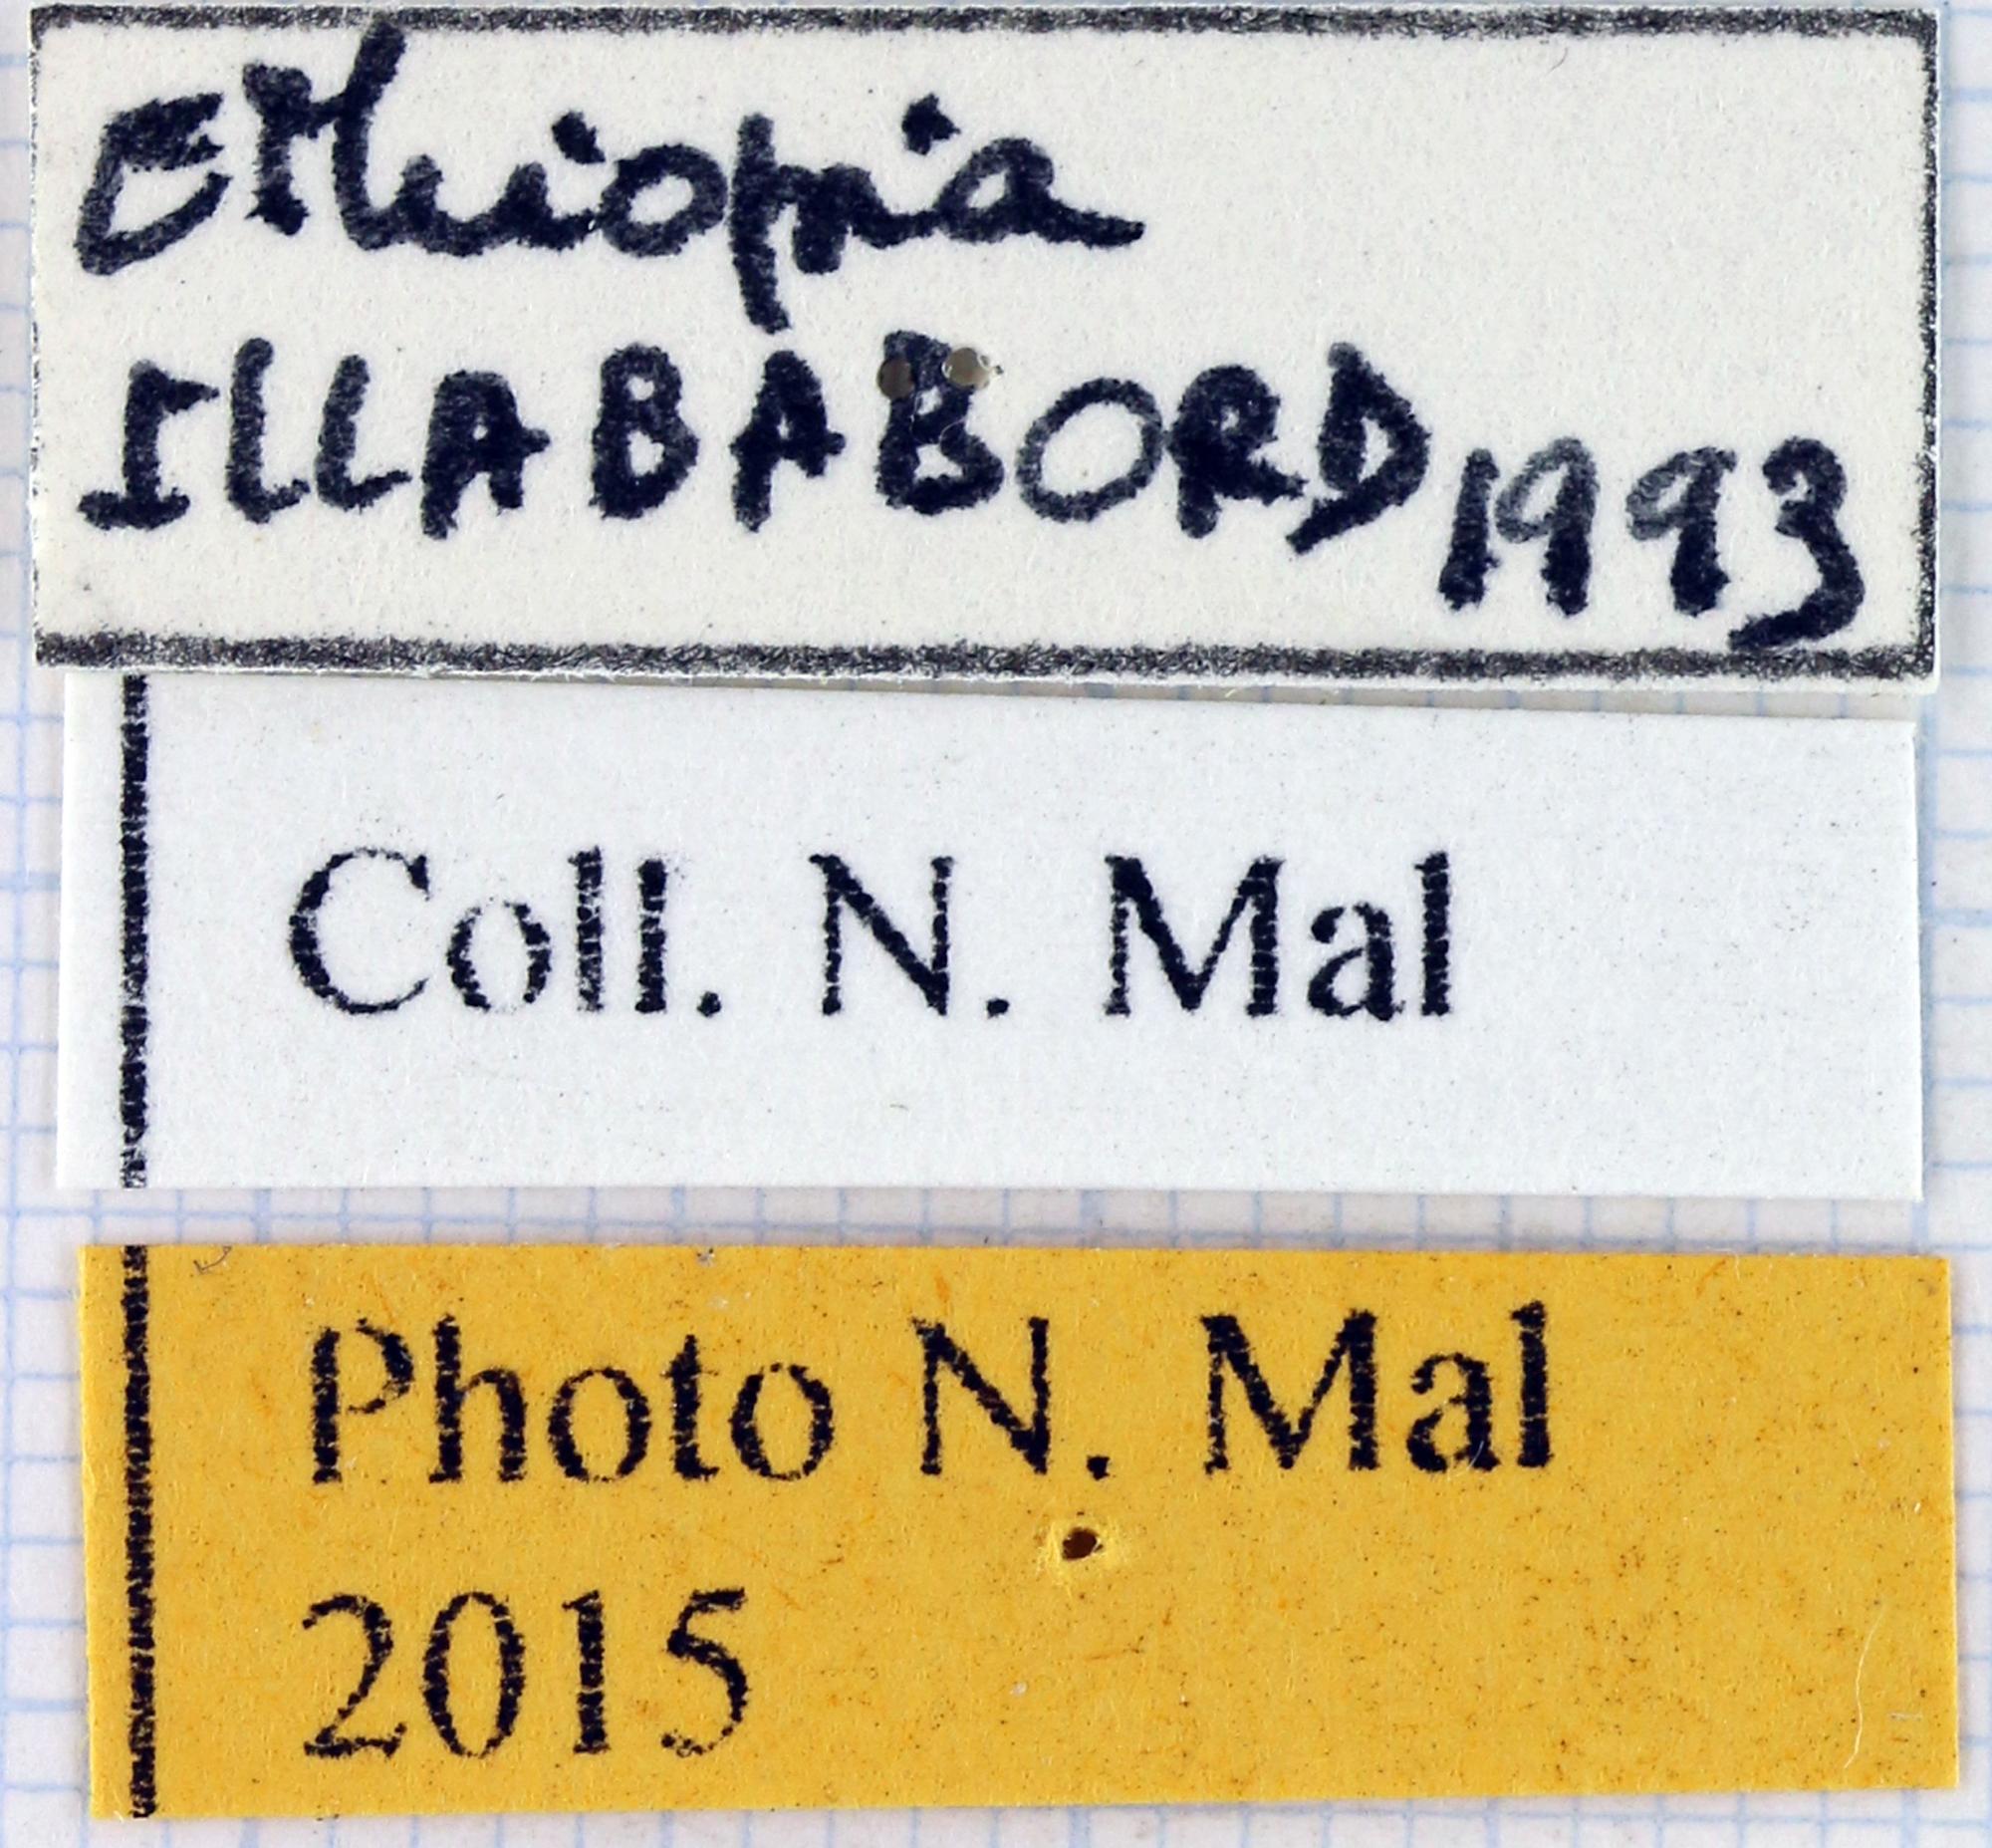 Compsocephalus dmitriewi dmitriewi label.jpg